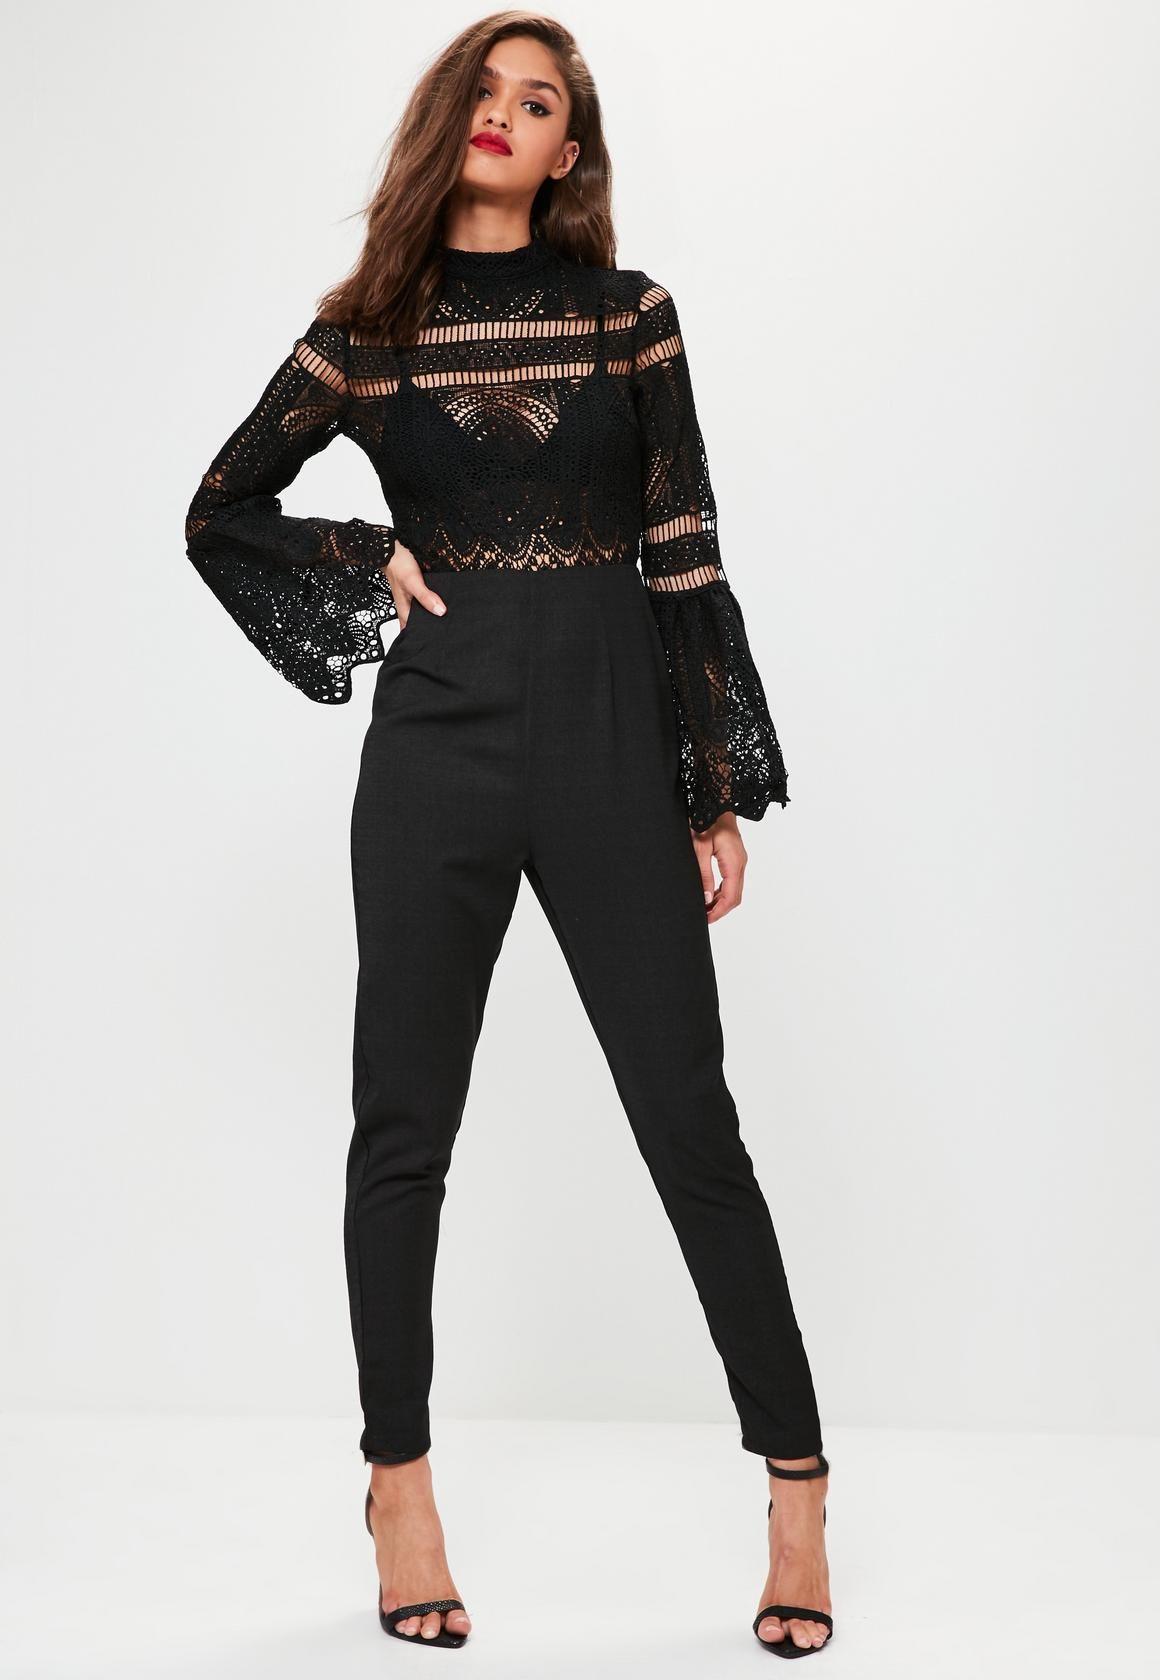 edc874c1d79 Black Crochet Lace Top Flare Sleeve Jumpsuit - Missguided